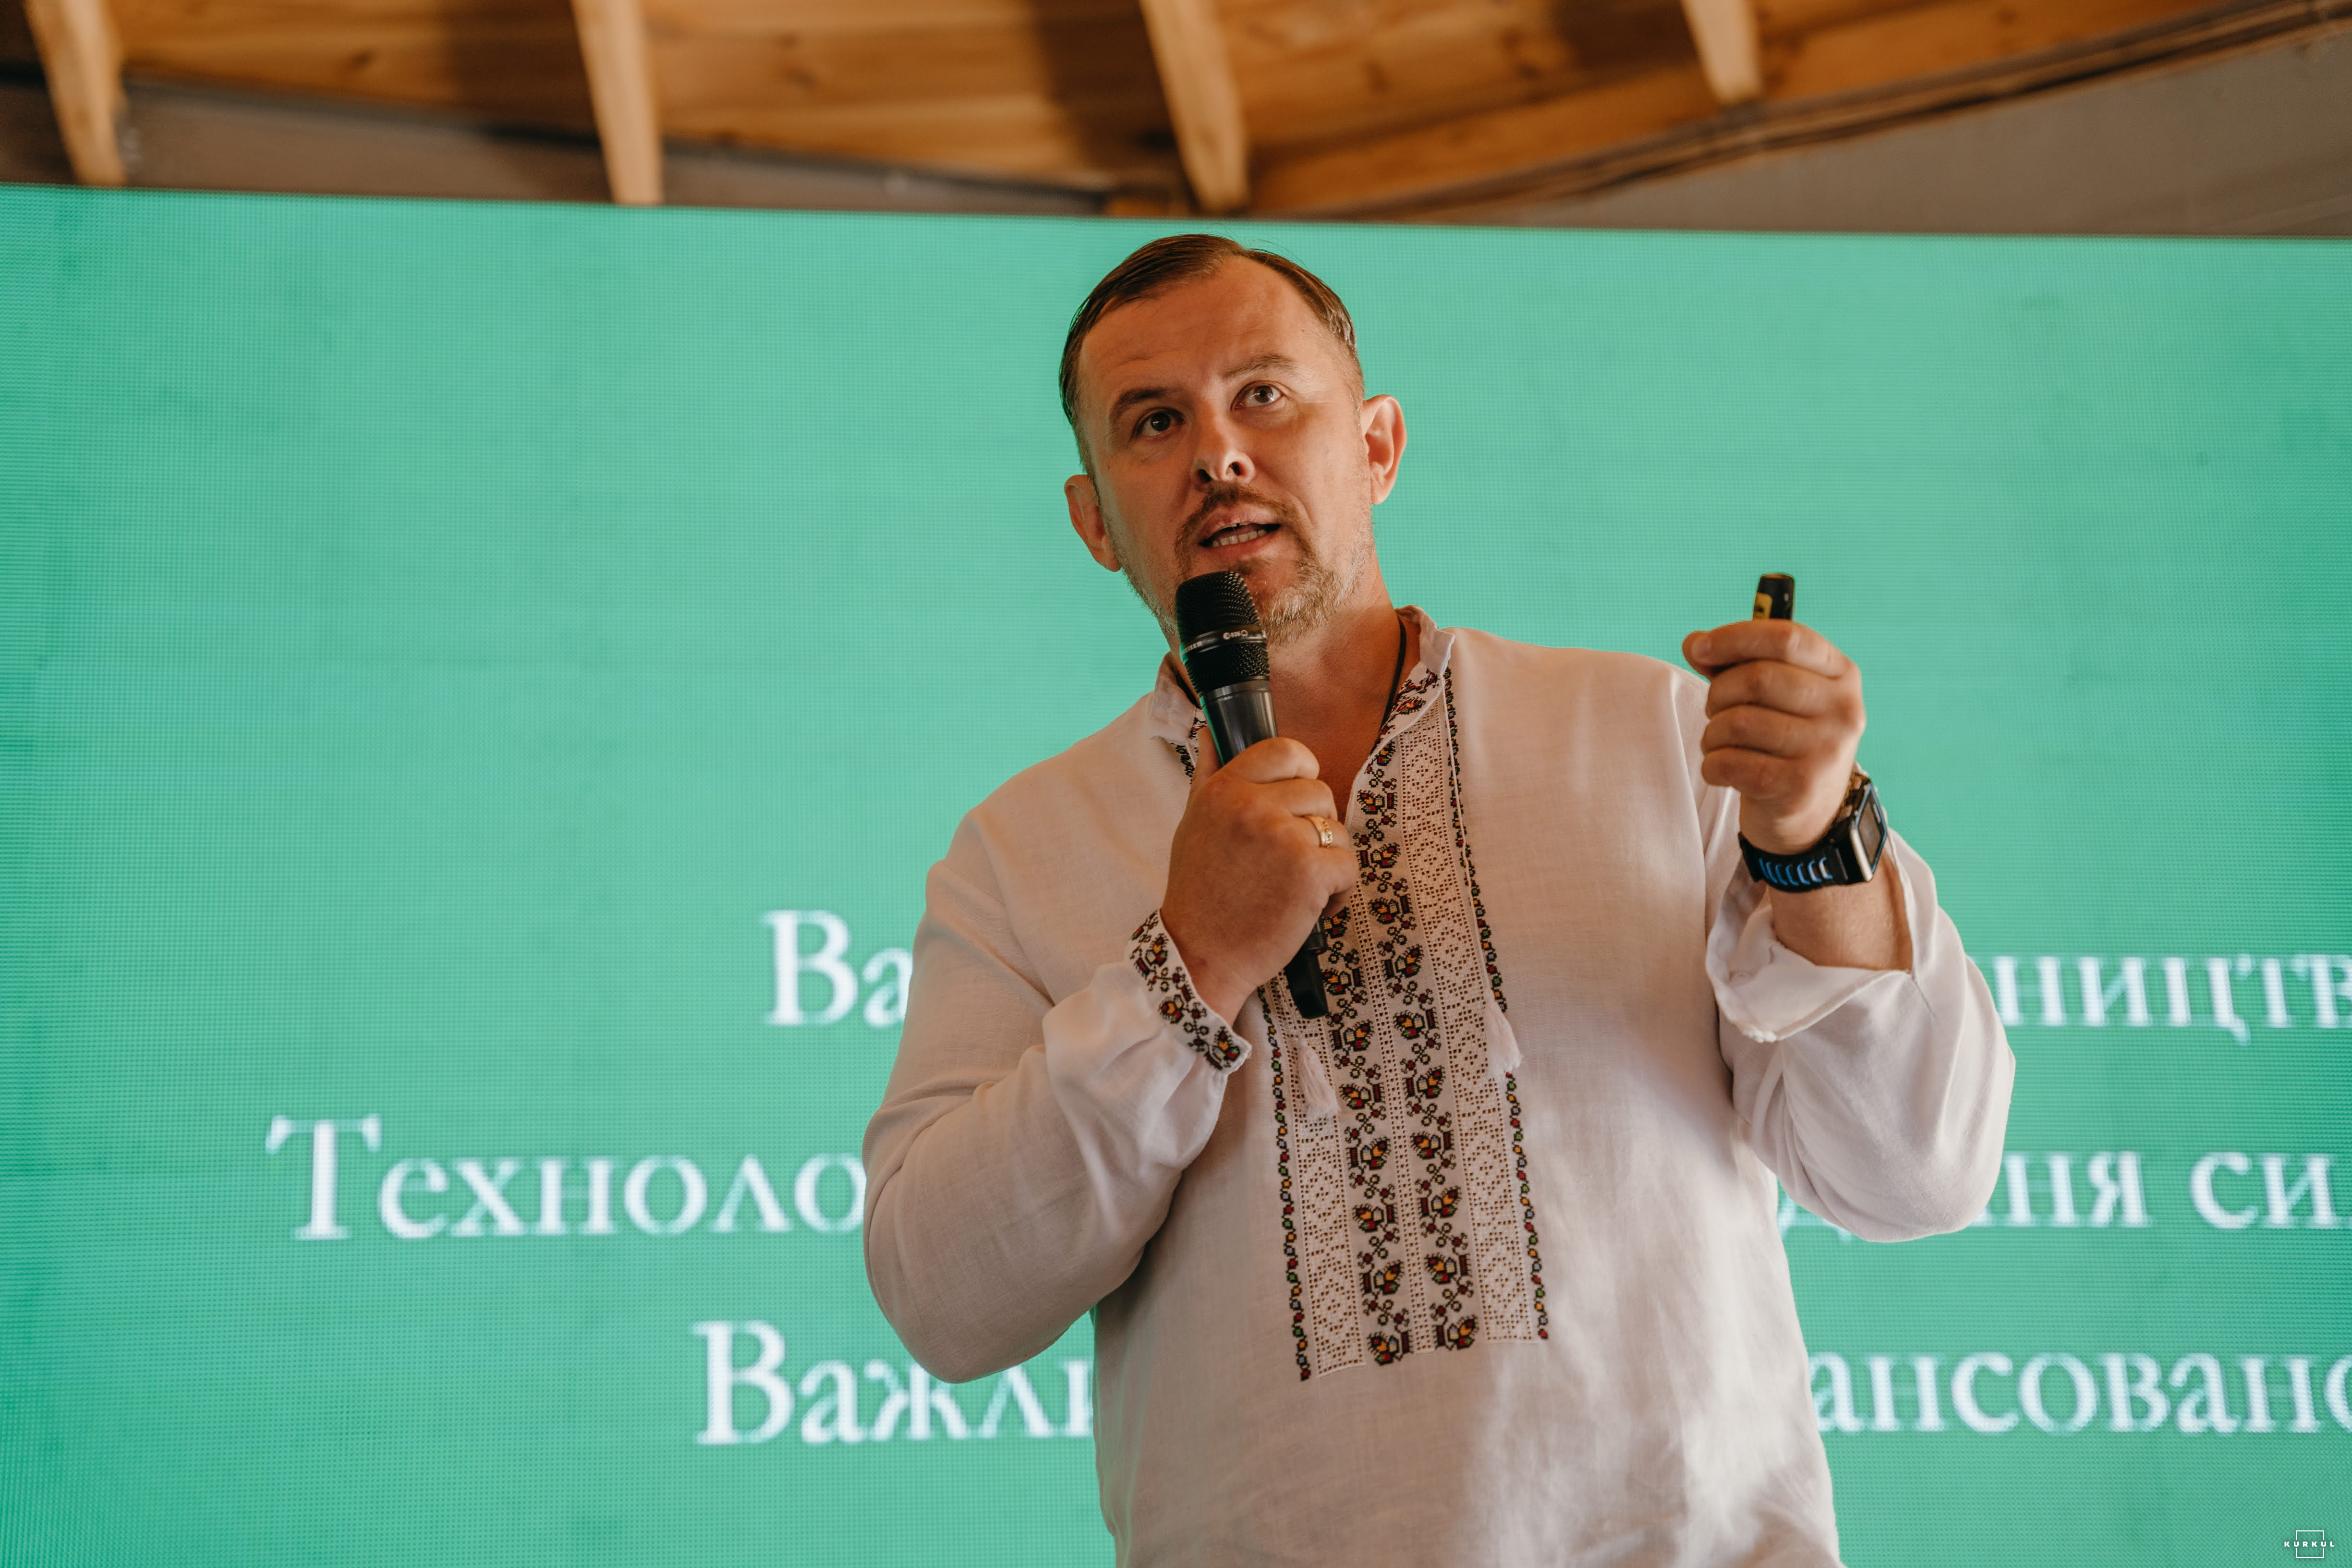 Михайло Травецький, кандидат ветеринарних наук, експерт у галузі тваринництва